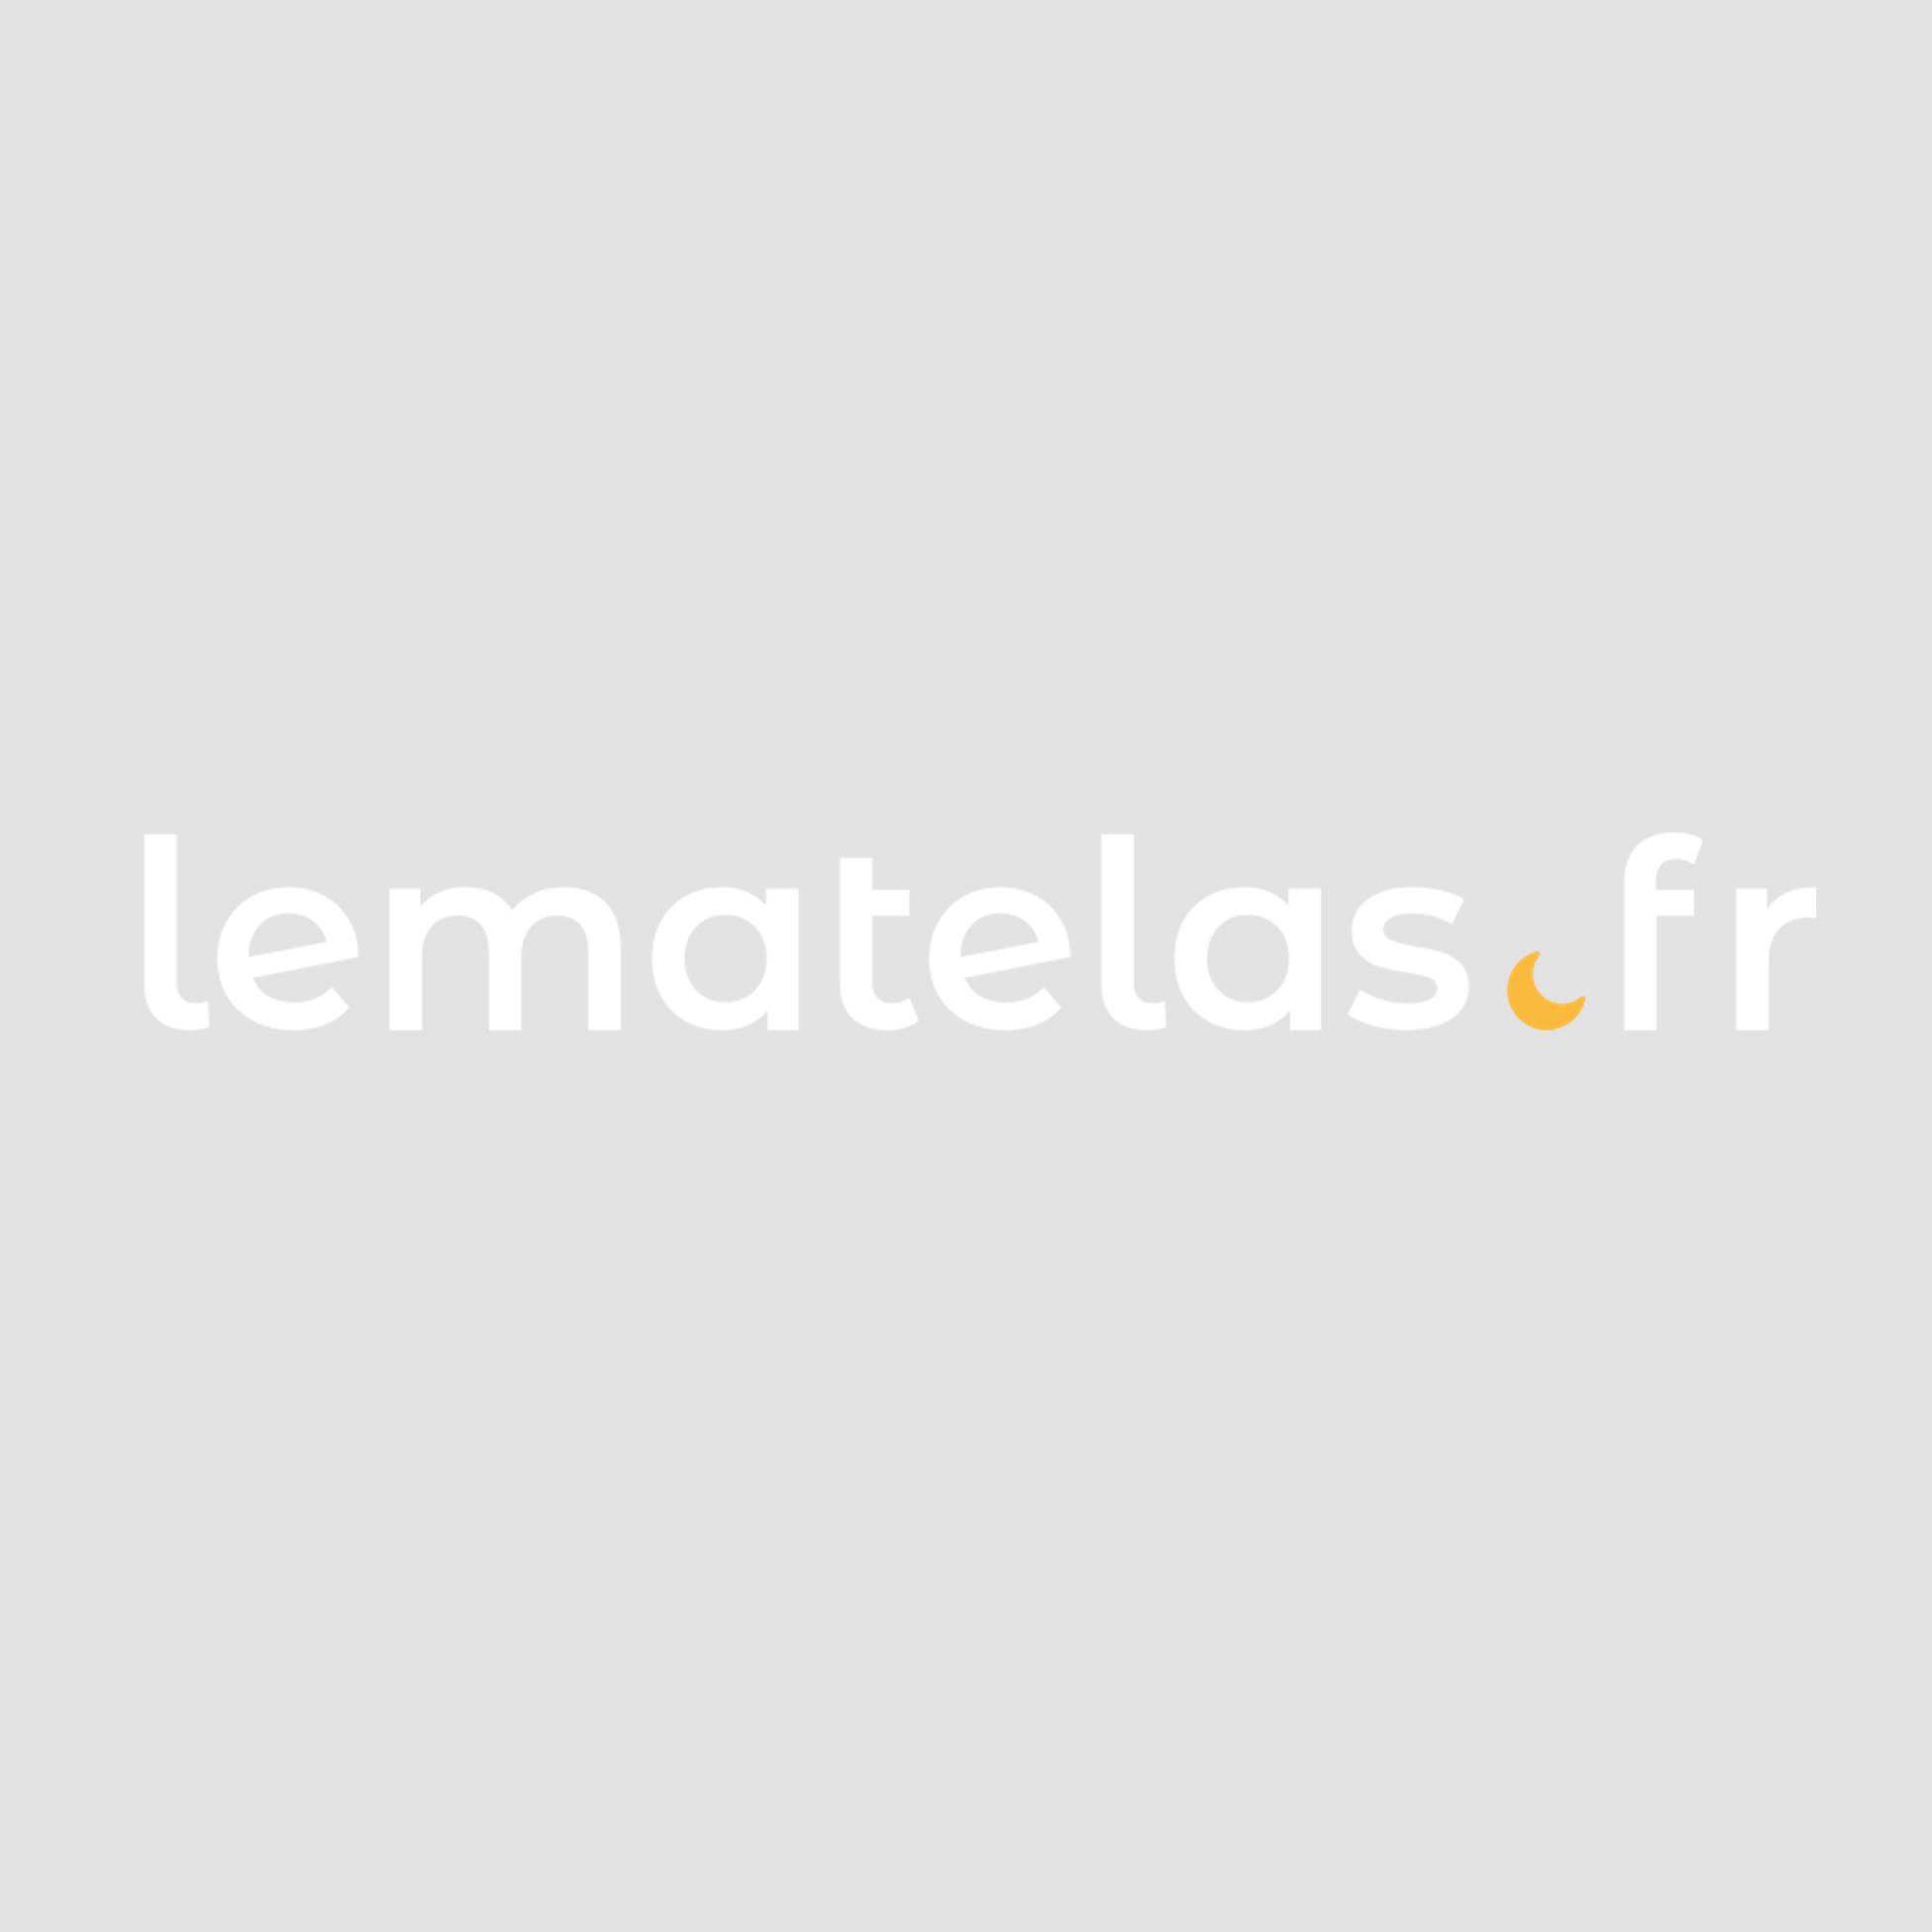 rideau gris coton lin 135x260. Black Bedroom Furniture Sets. Home Design Ideas